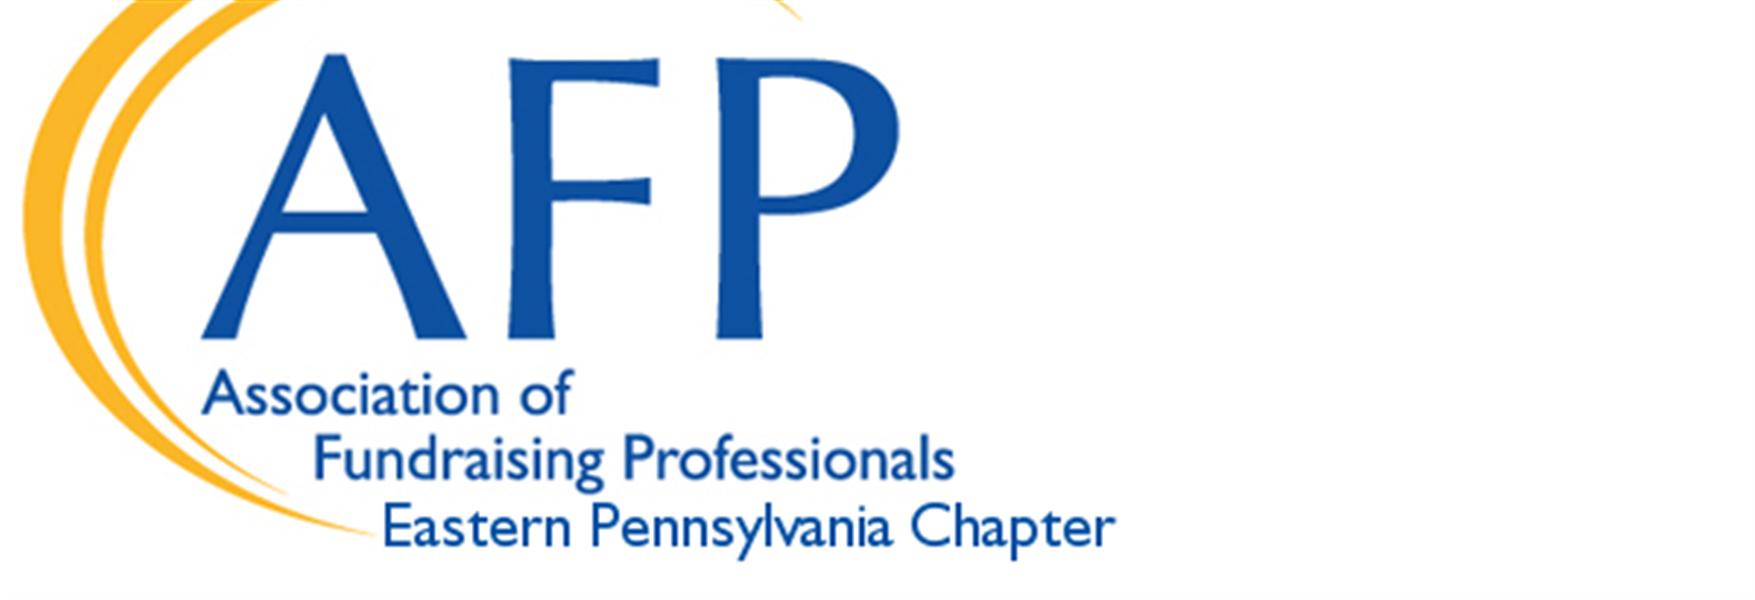 6f2eecb6-9d69-41f4-b66f-1de1ca84045a_AFP - EPA Logo.php.png